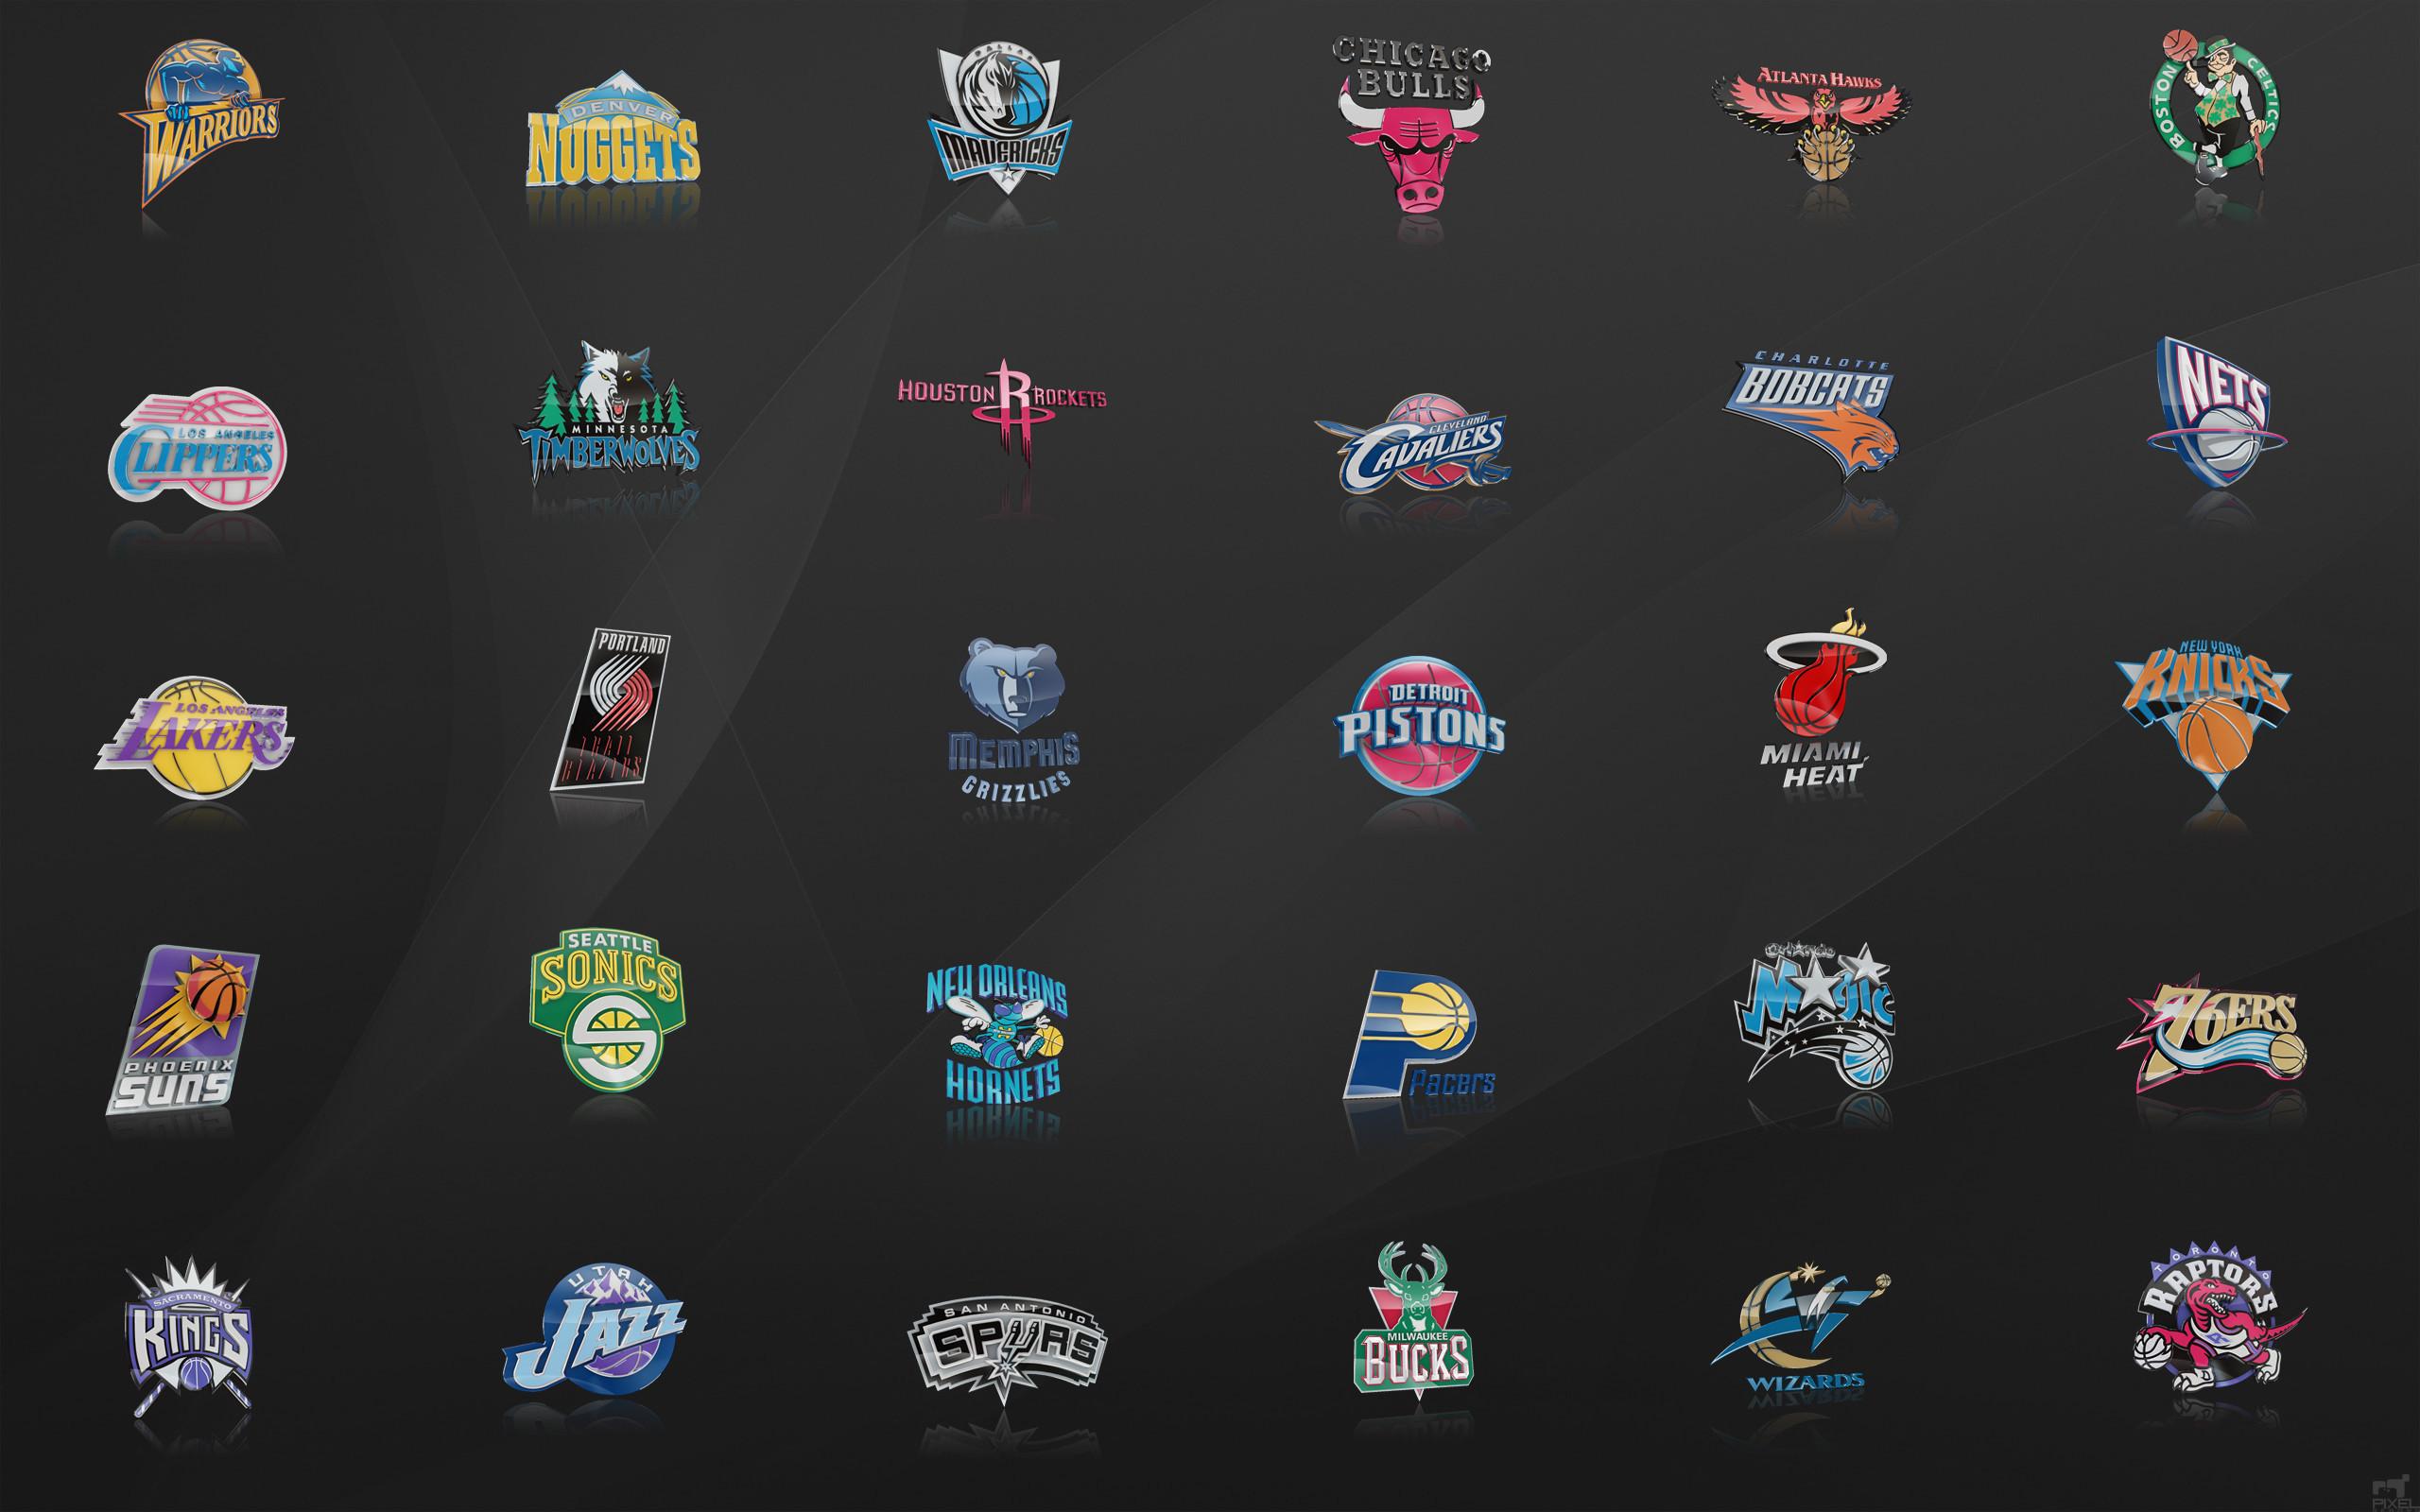 NBA Team Logos Wallpaper by nbafan on DeviantArt